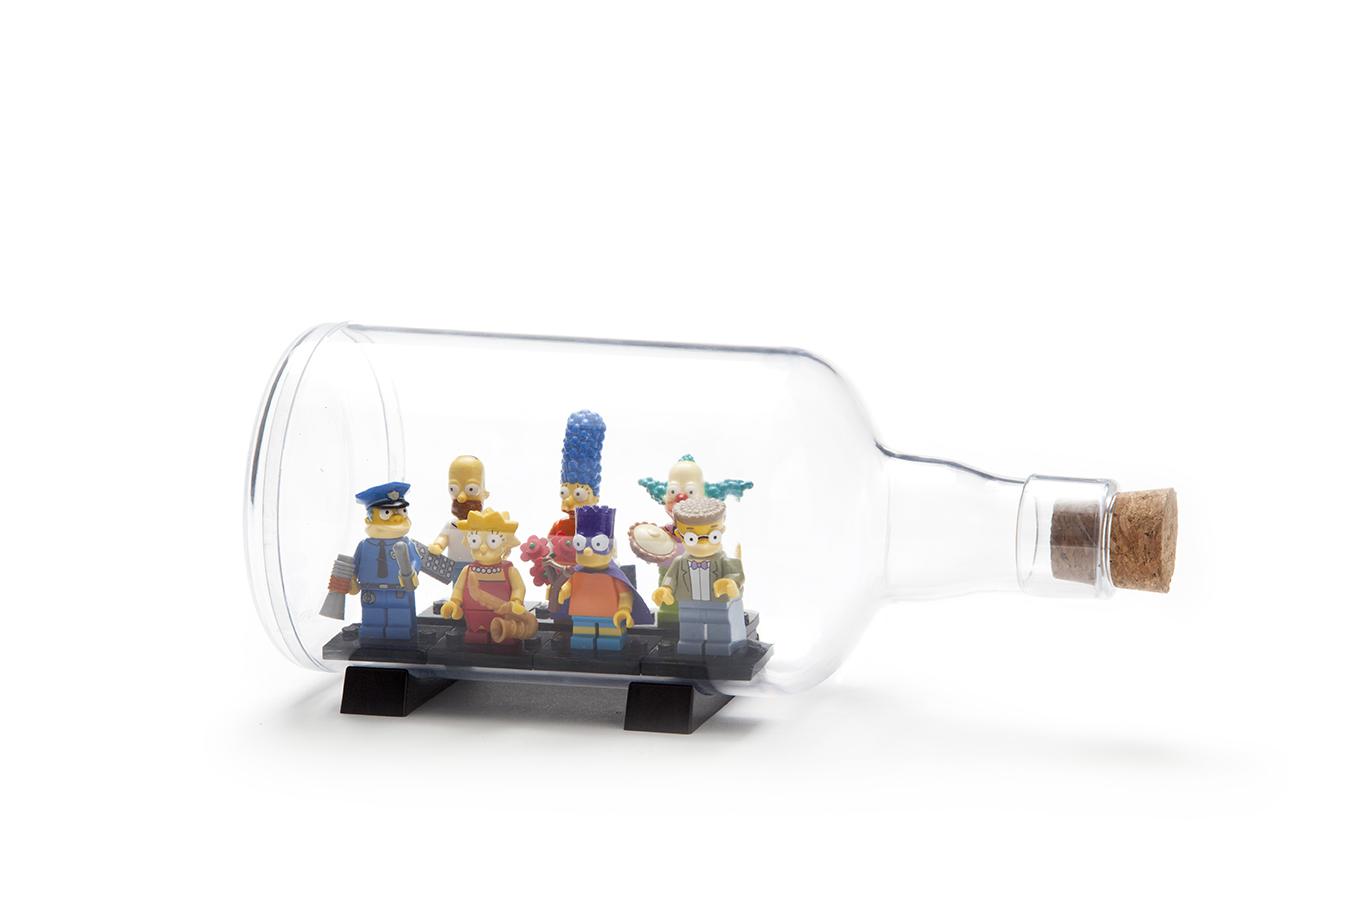 Peleg-impossible bottle_72dpi_ (25)